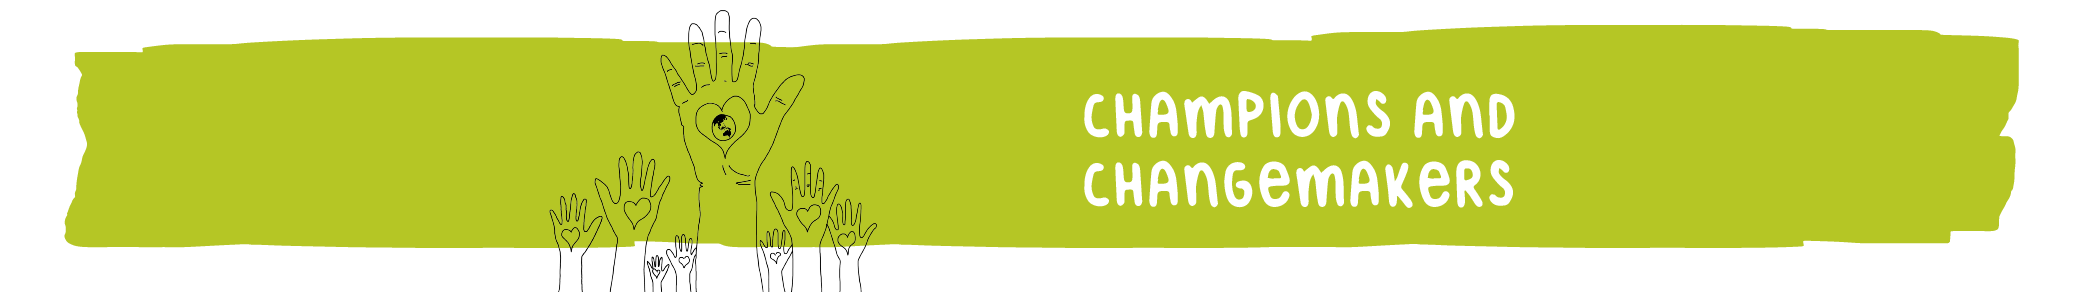 Changemaker Champions